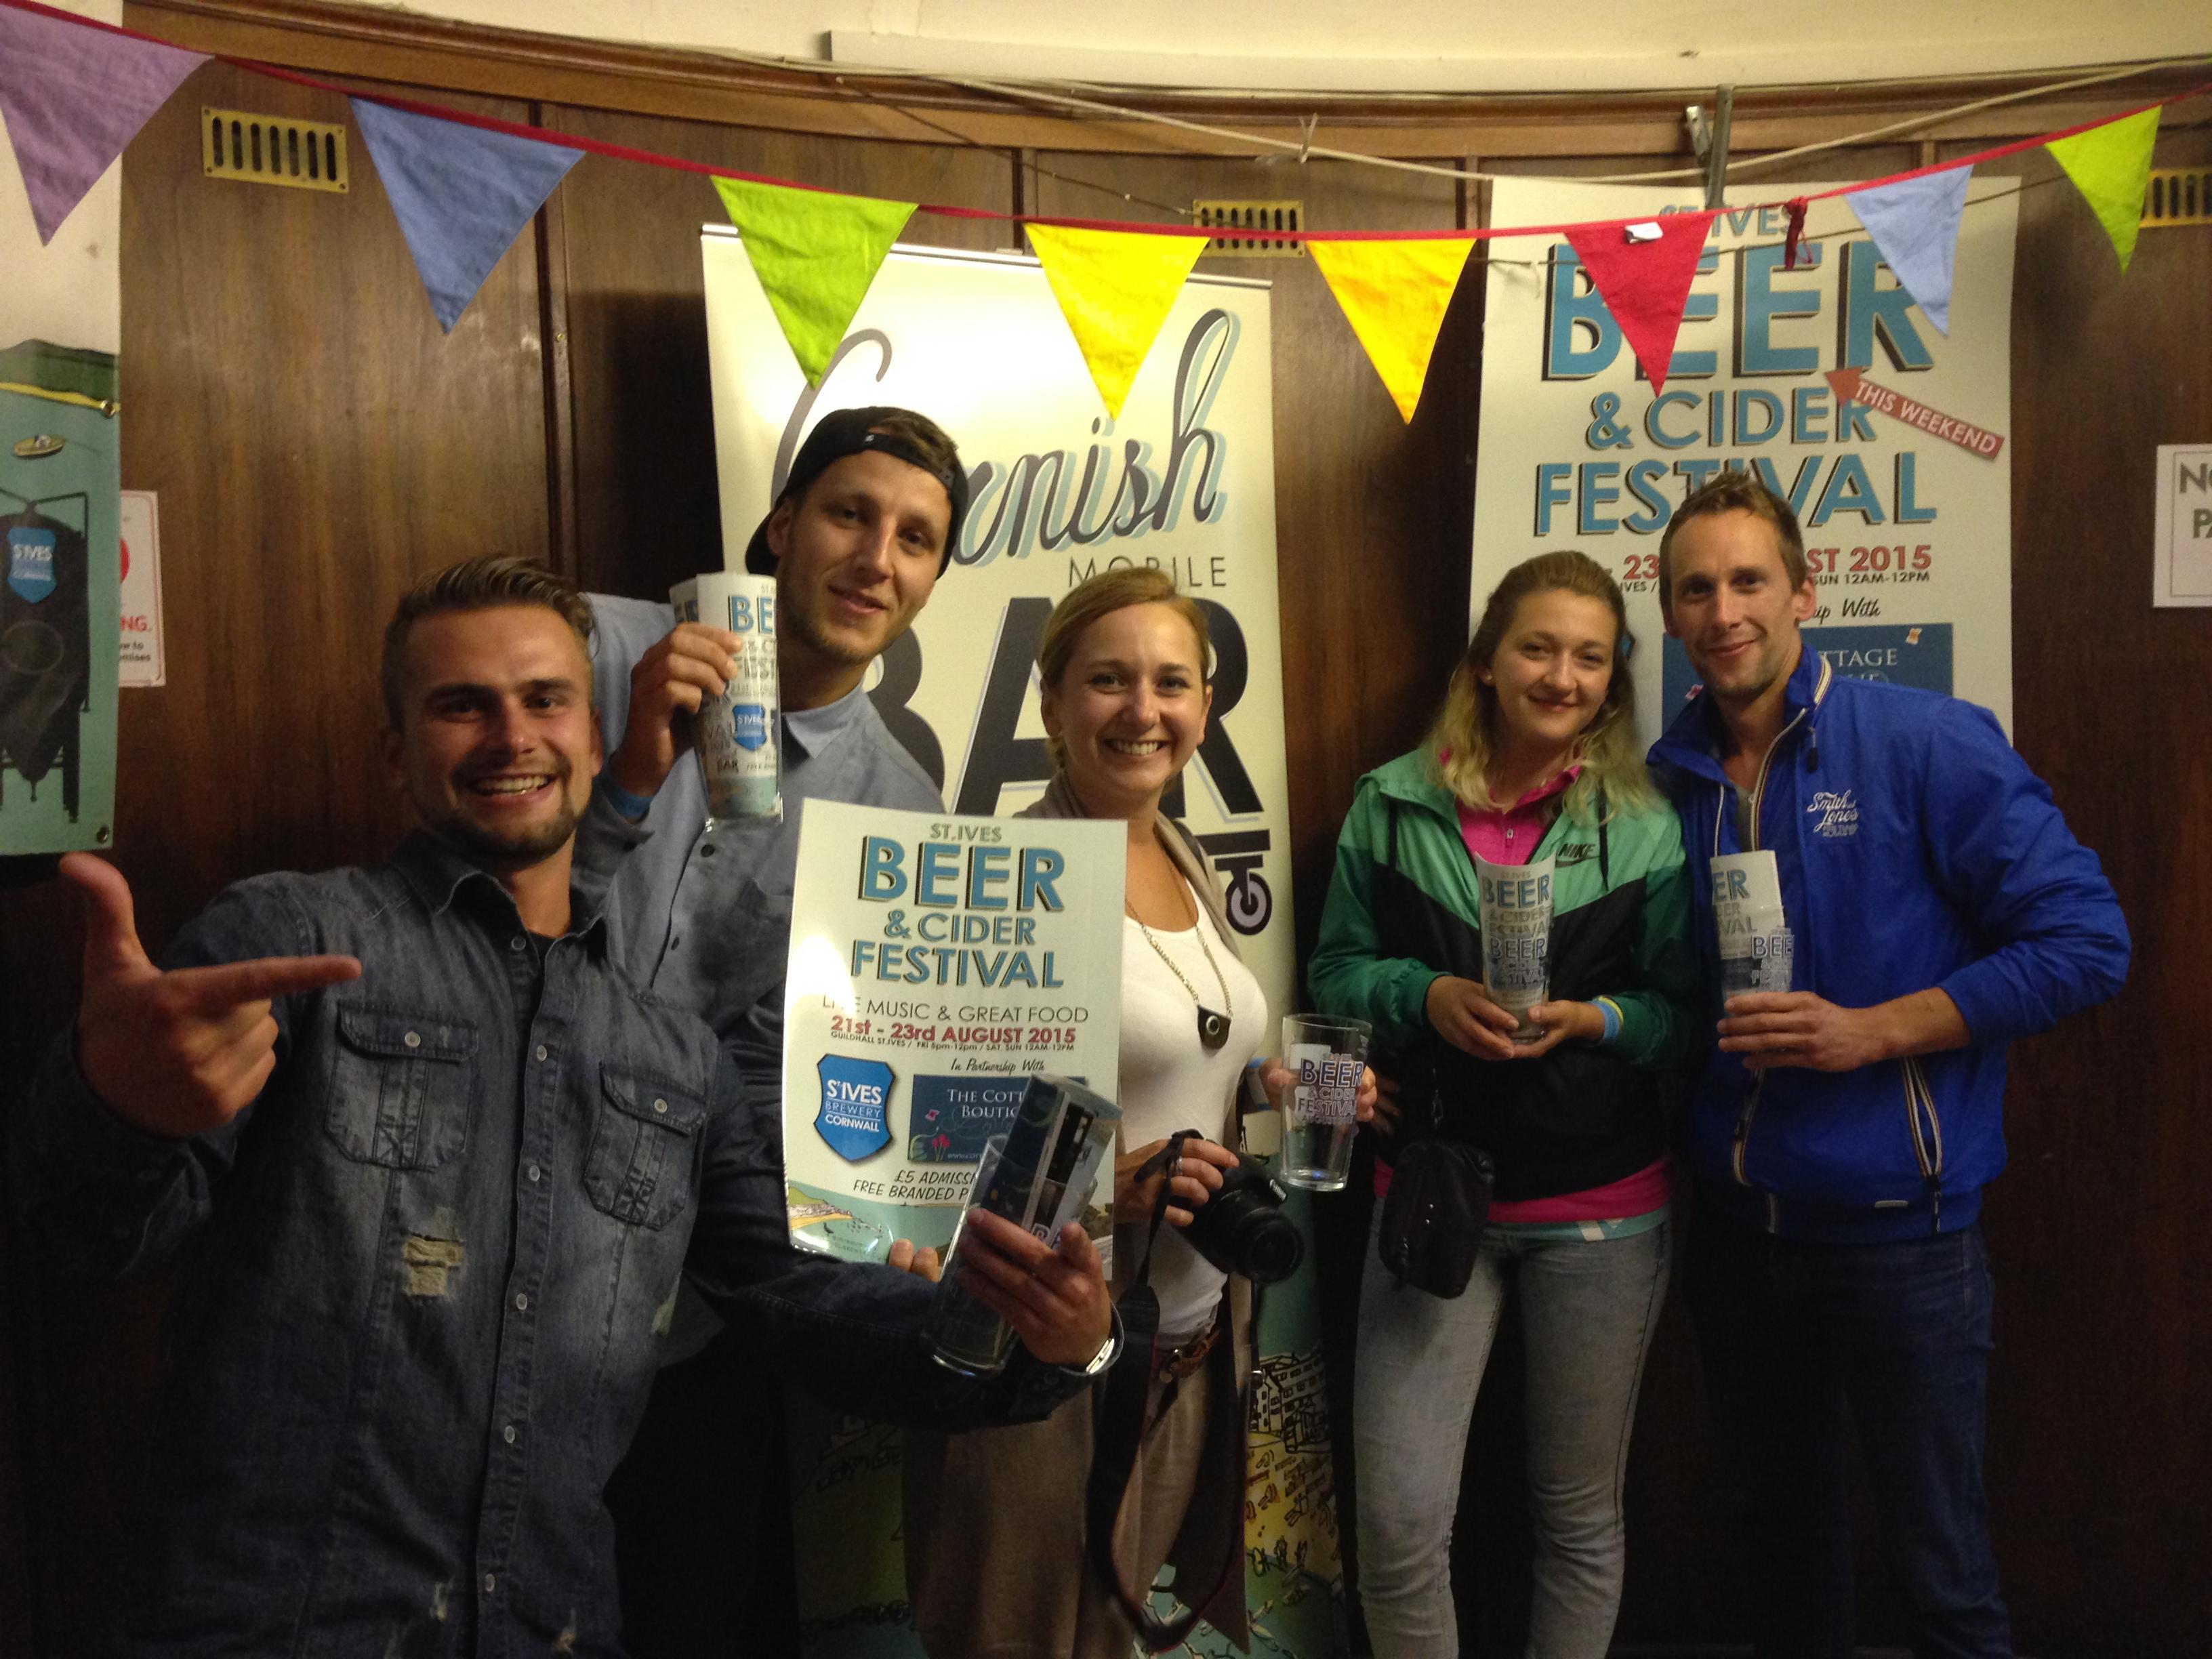 Cohort Beer Team